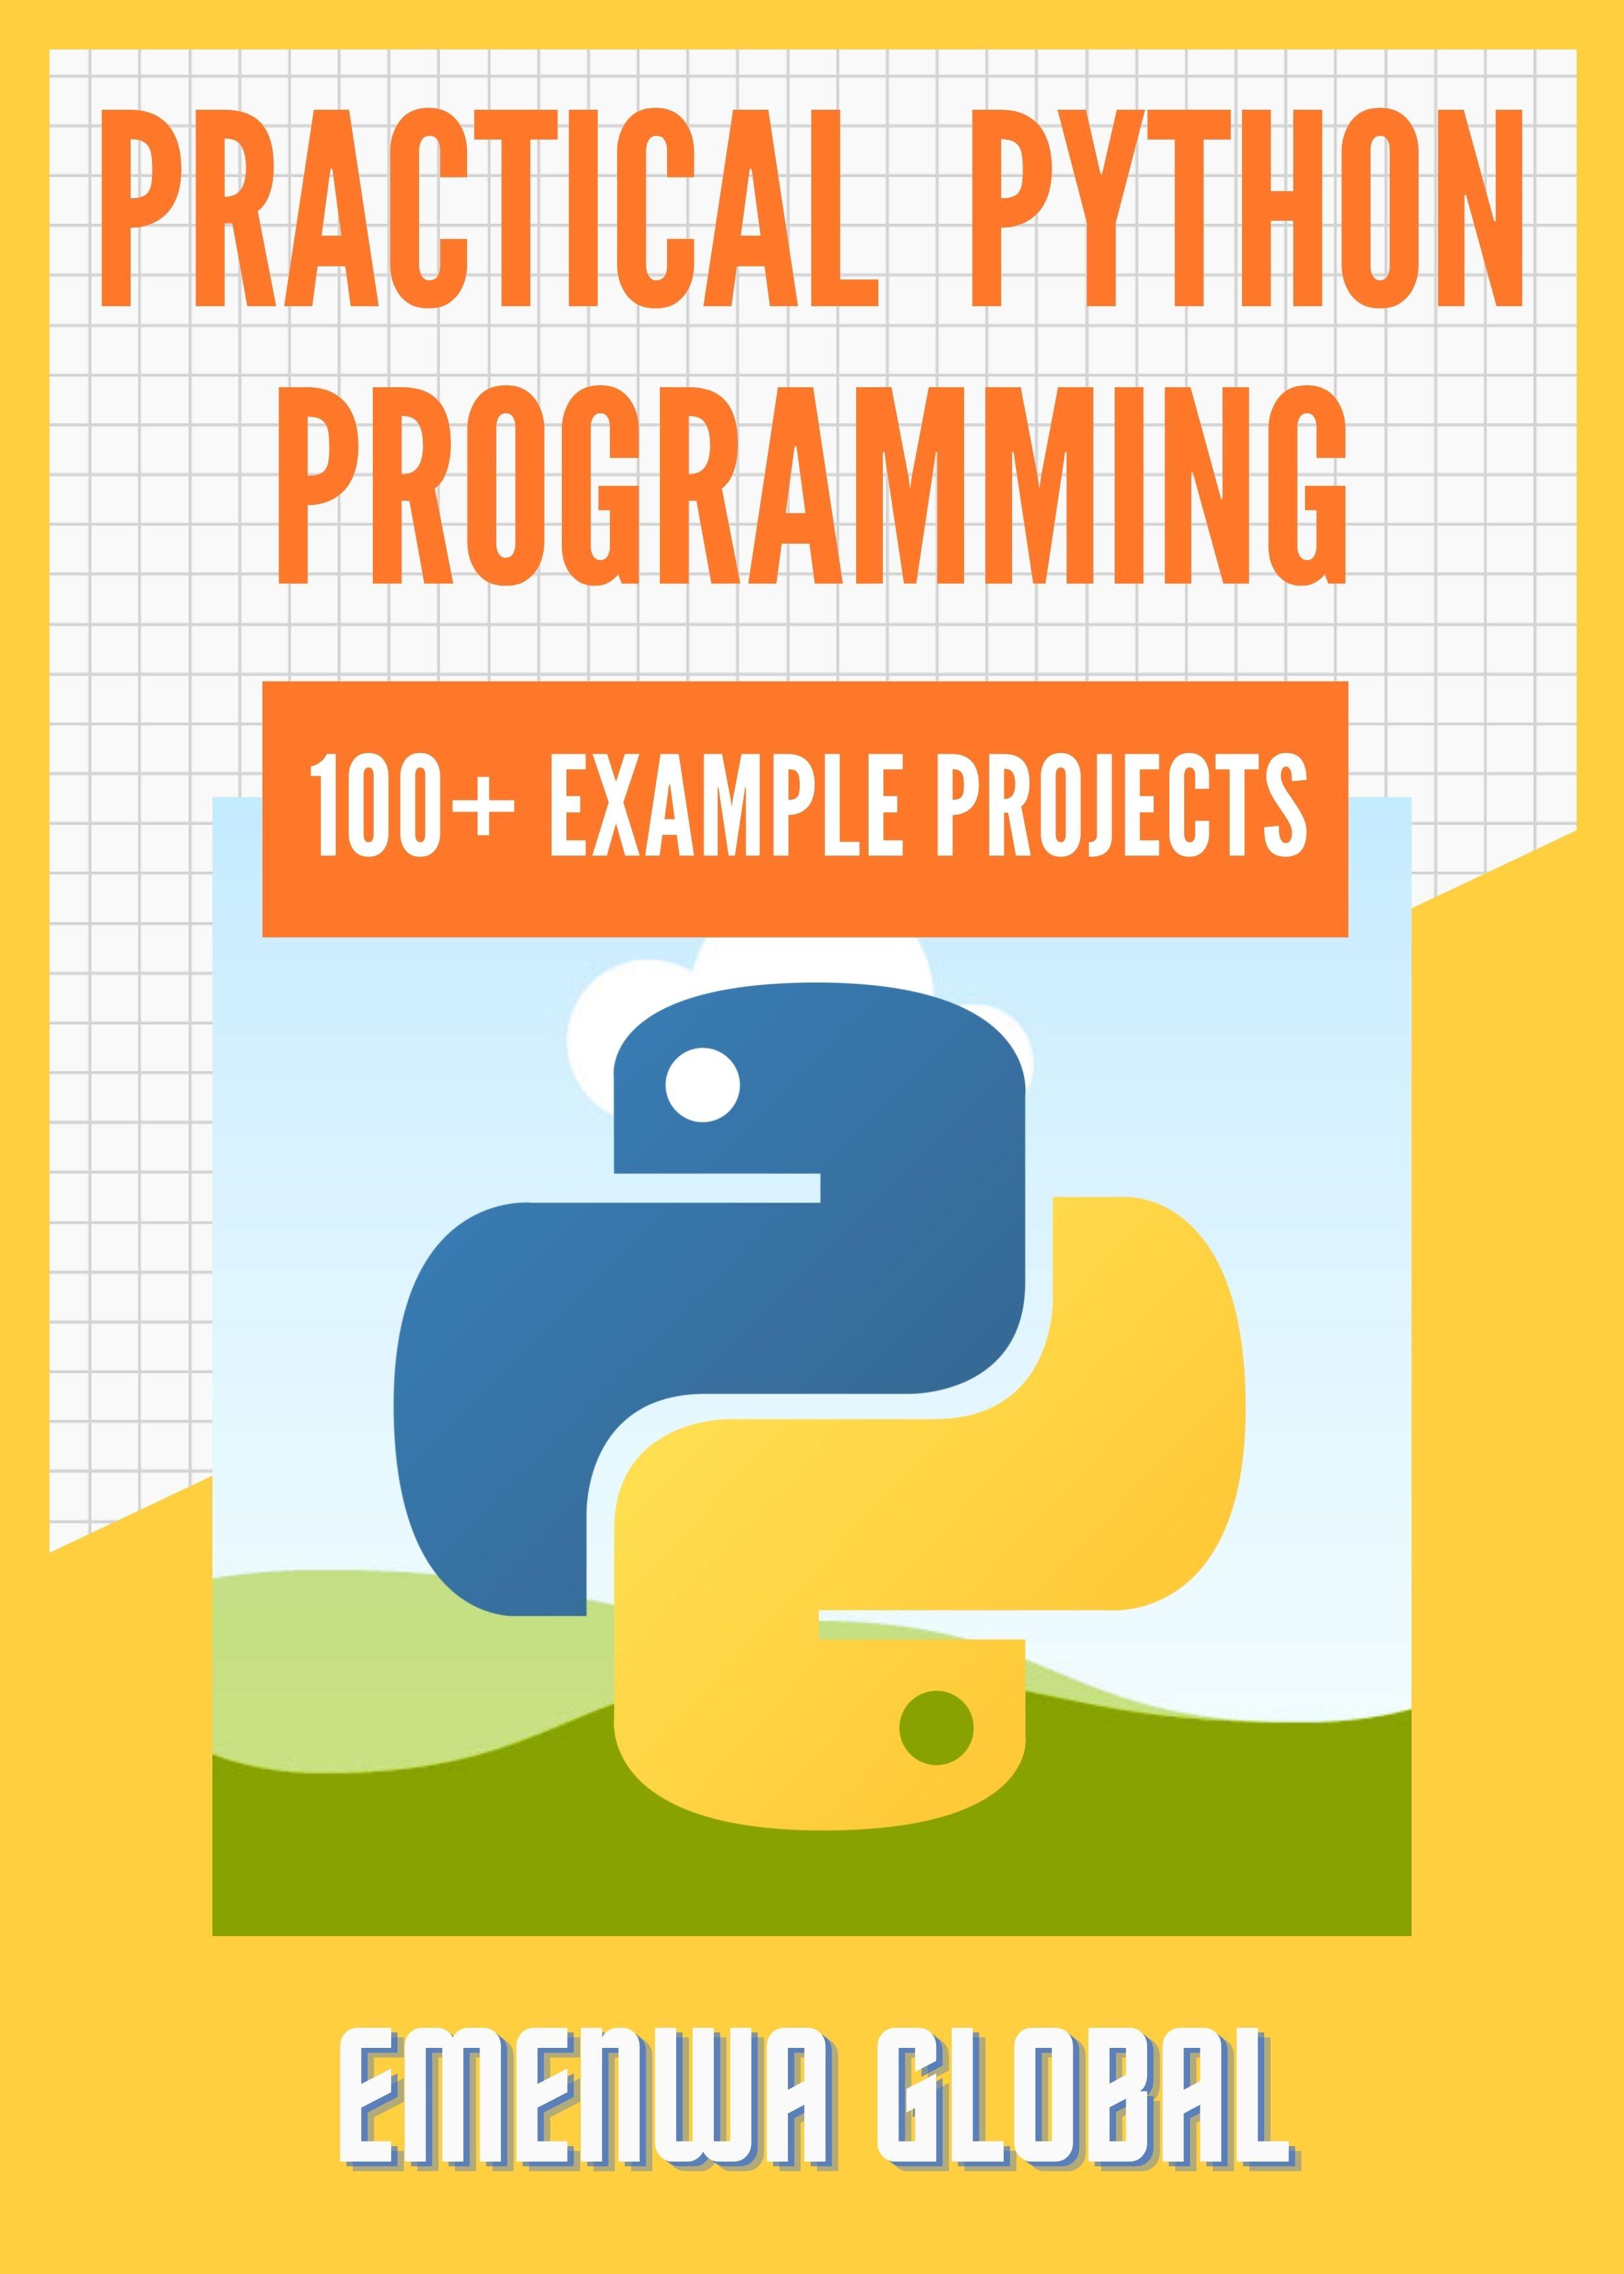 Practical Python Programming